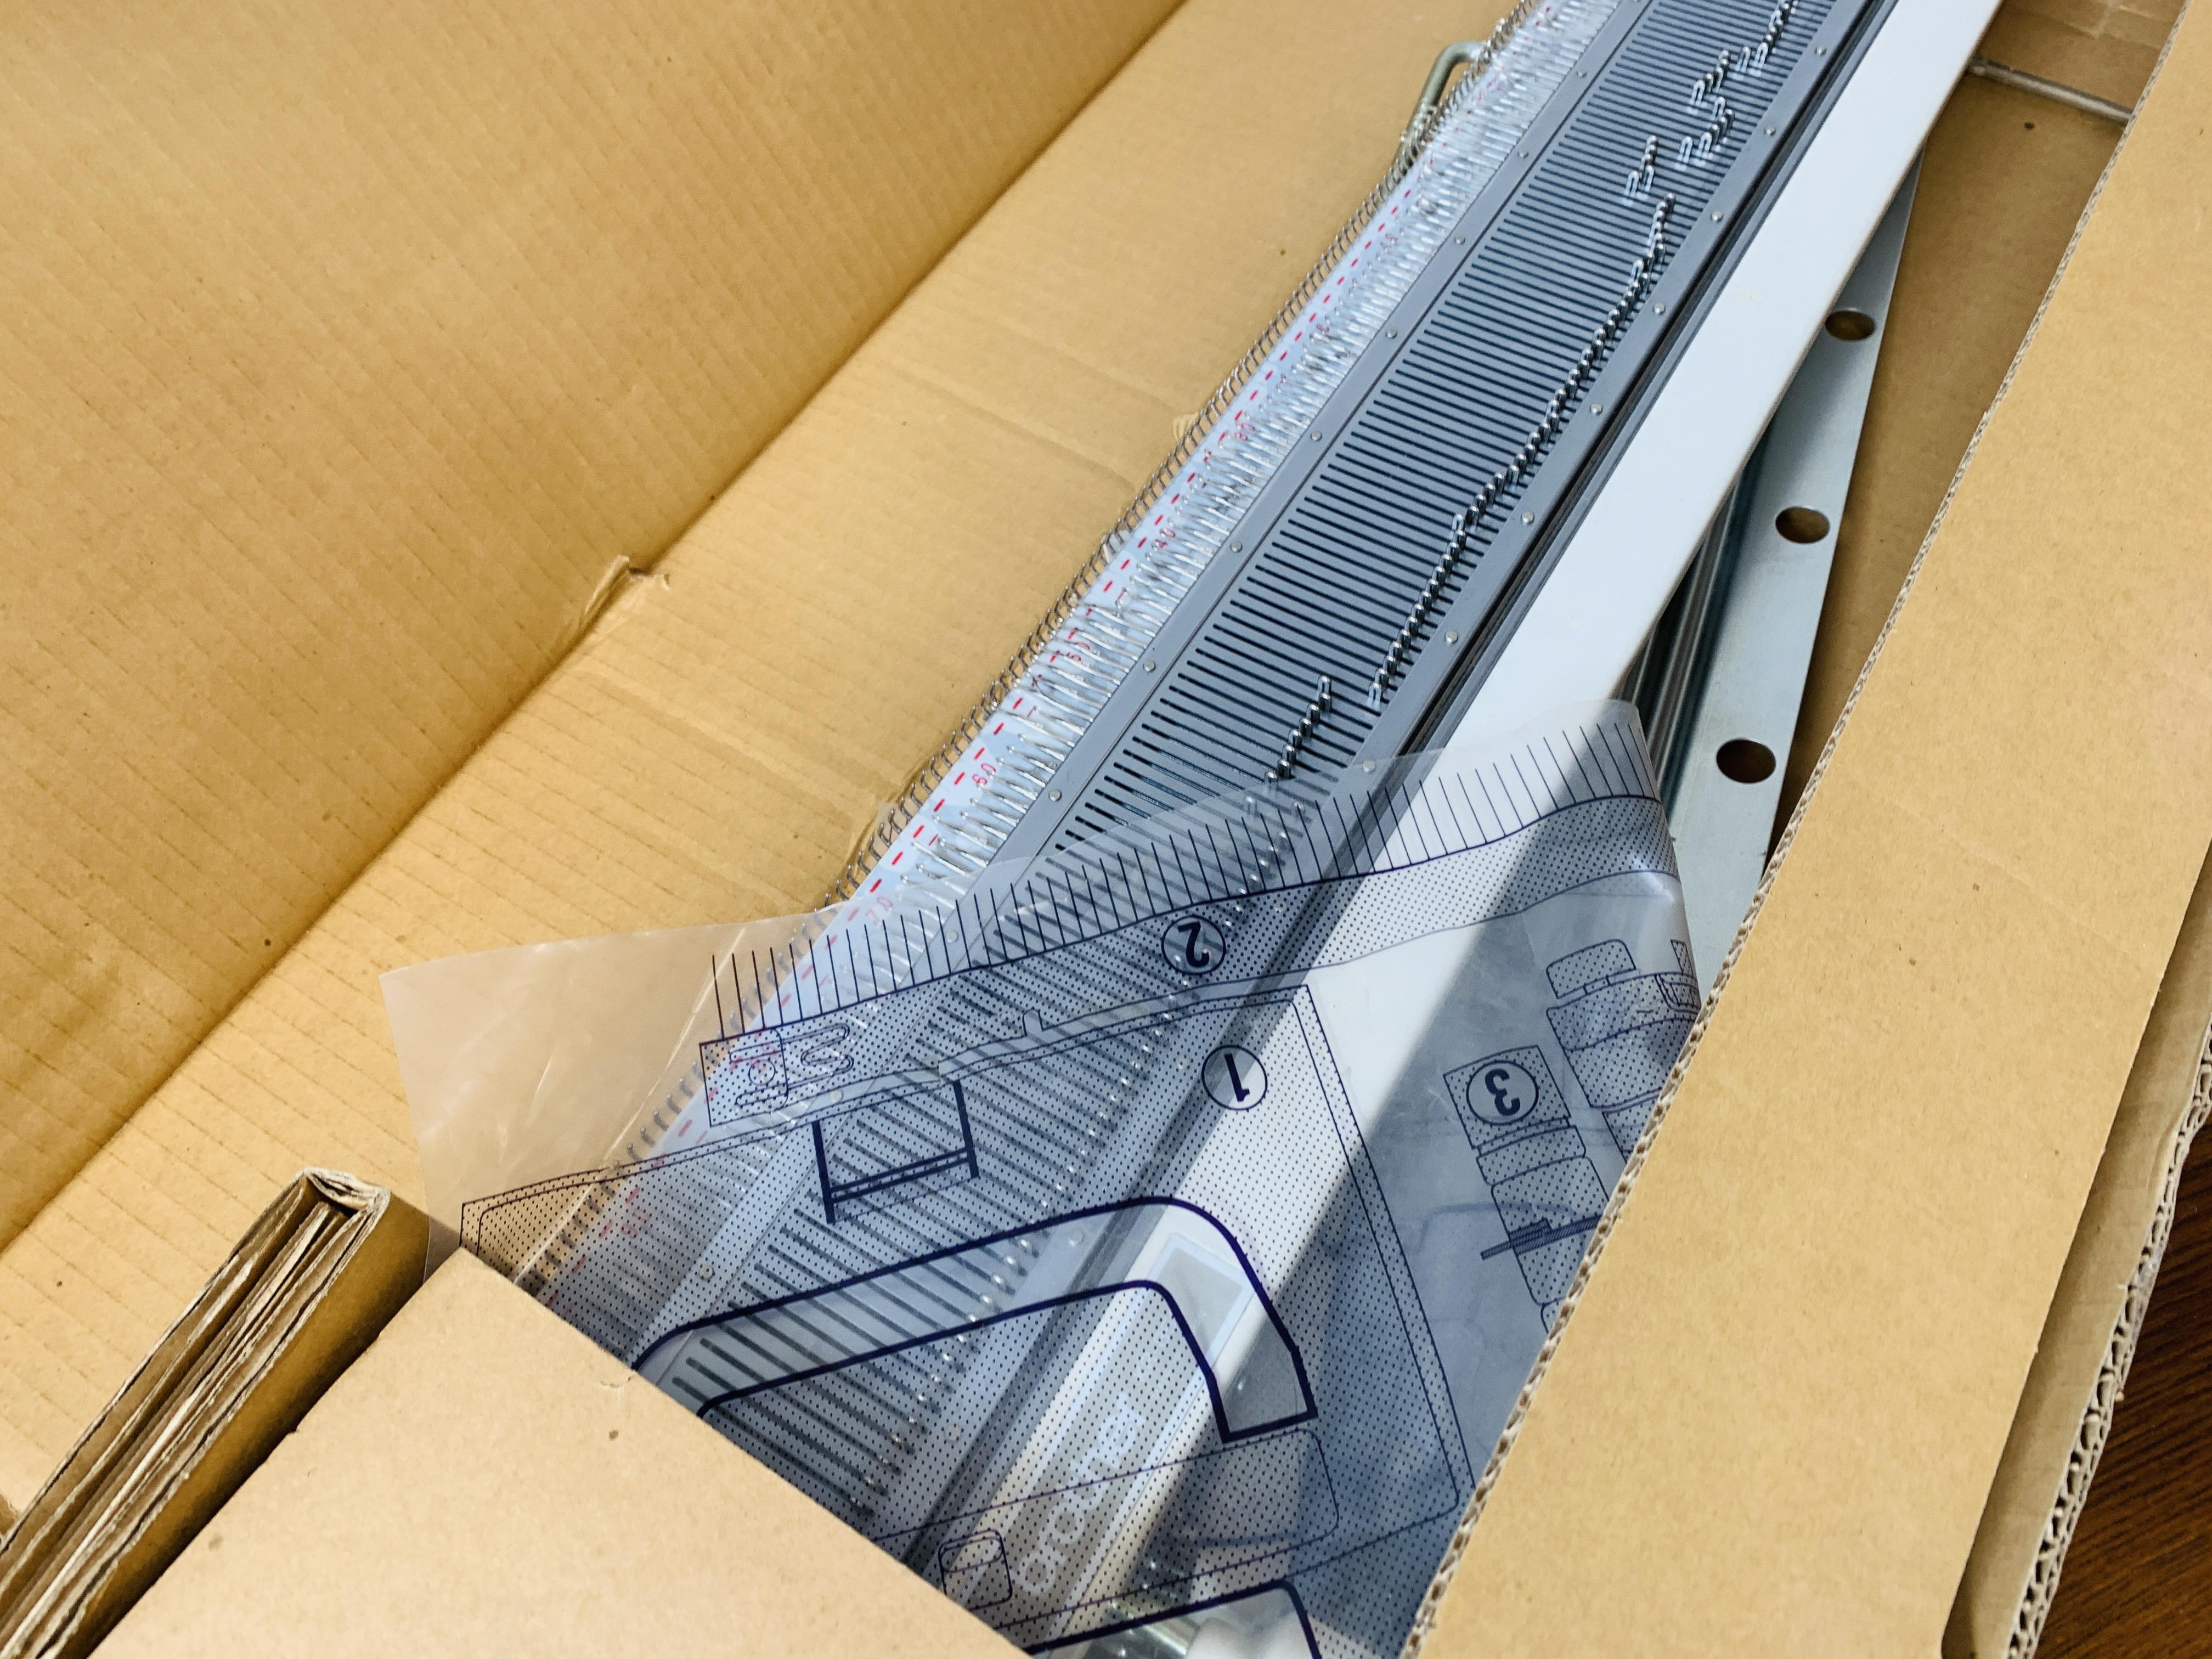 ART KITTEN KNITTING MACHINE MODE DX-1000 SERIAL NO. 97009 + BROTHER KNITTING MACHINE MODEL KH - 890. - Image 5 of 7